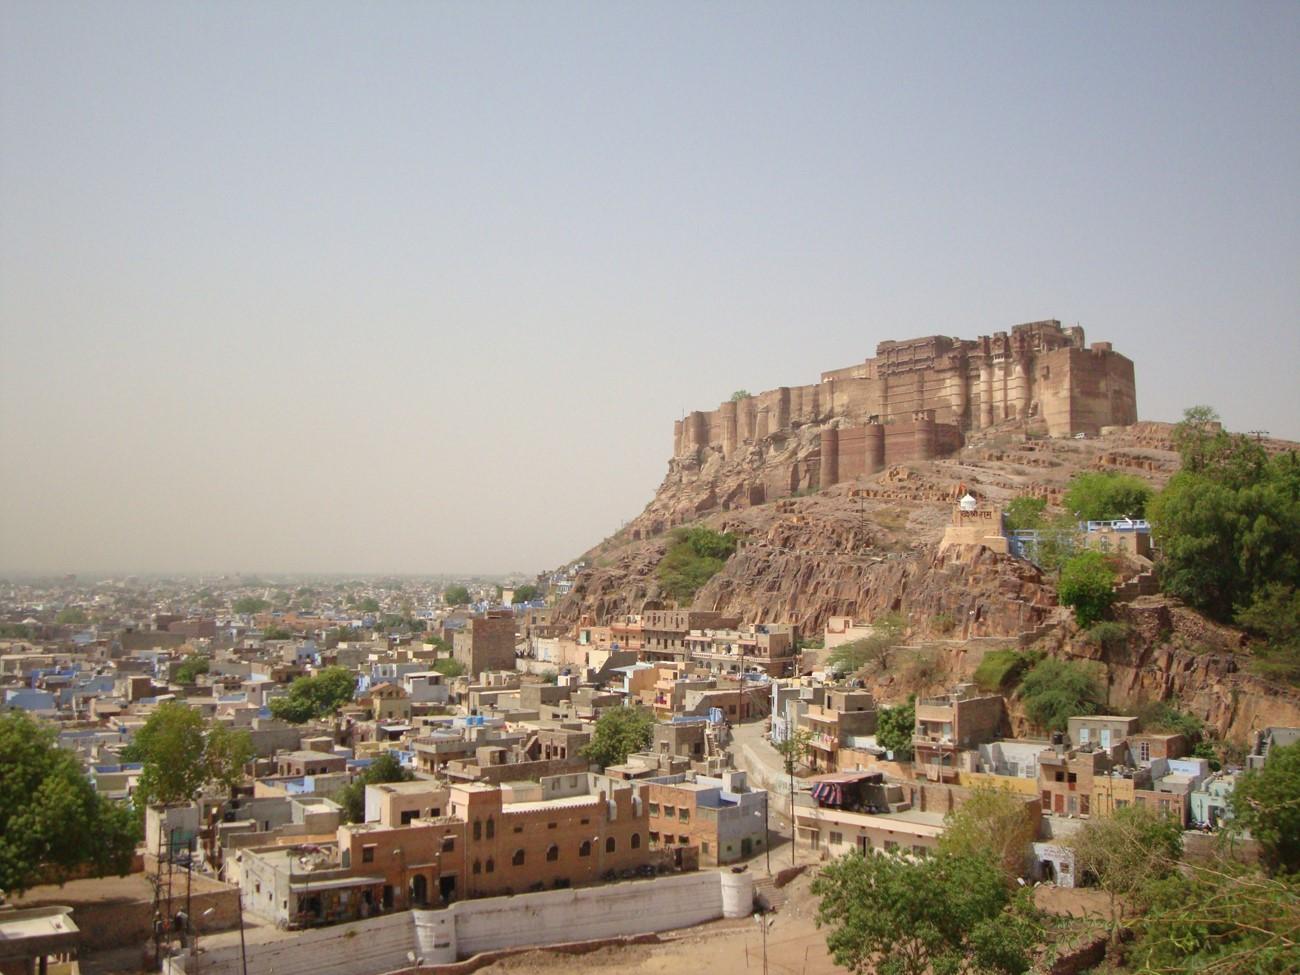 Residency at Mehrangarh Fort, Jodhpur, India, Robert Foster